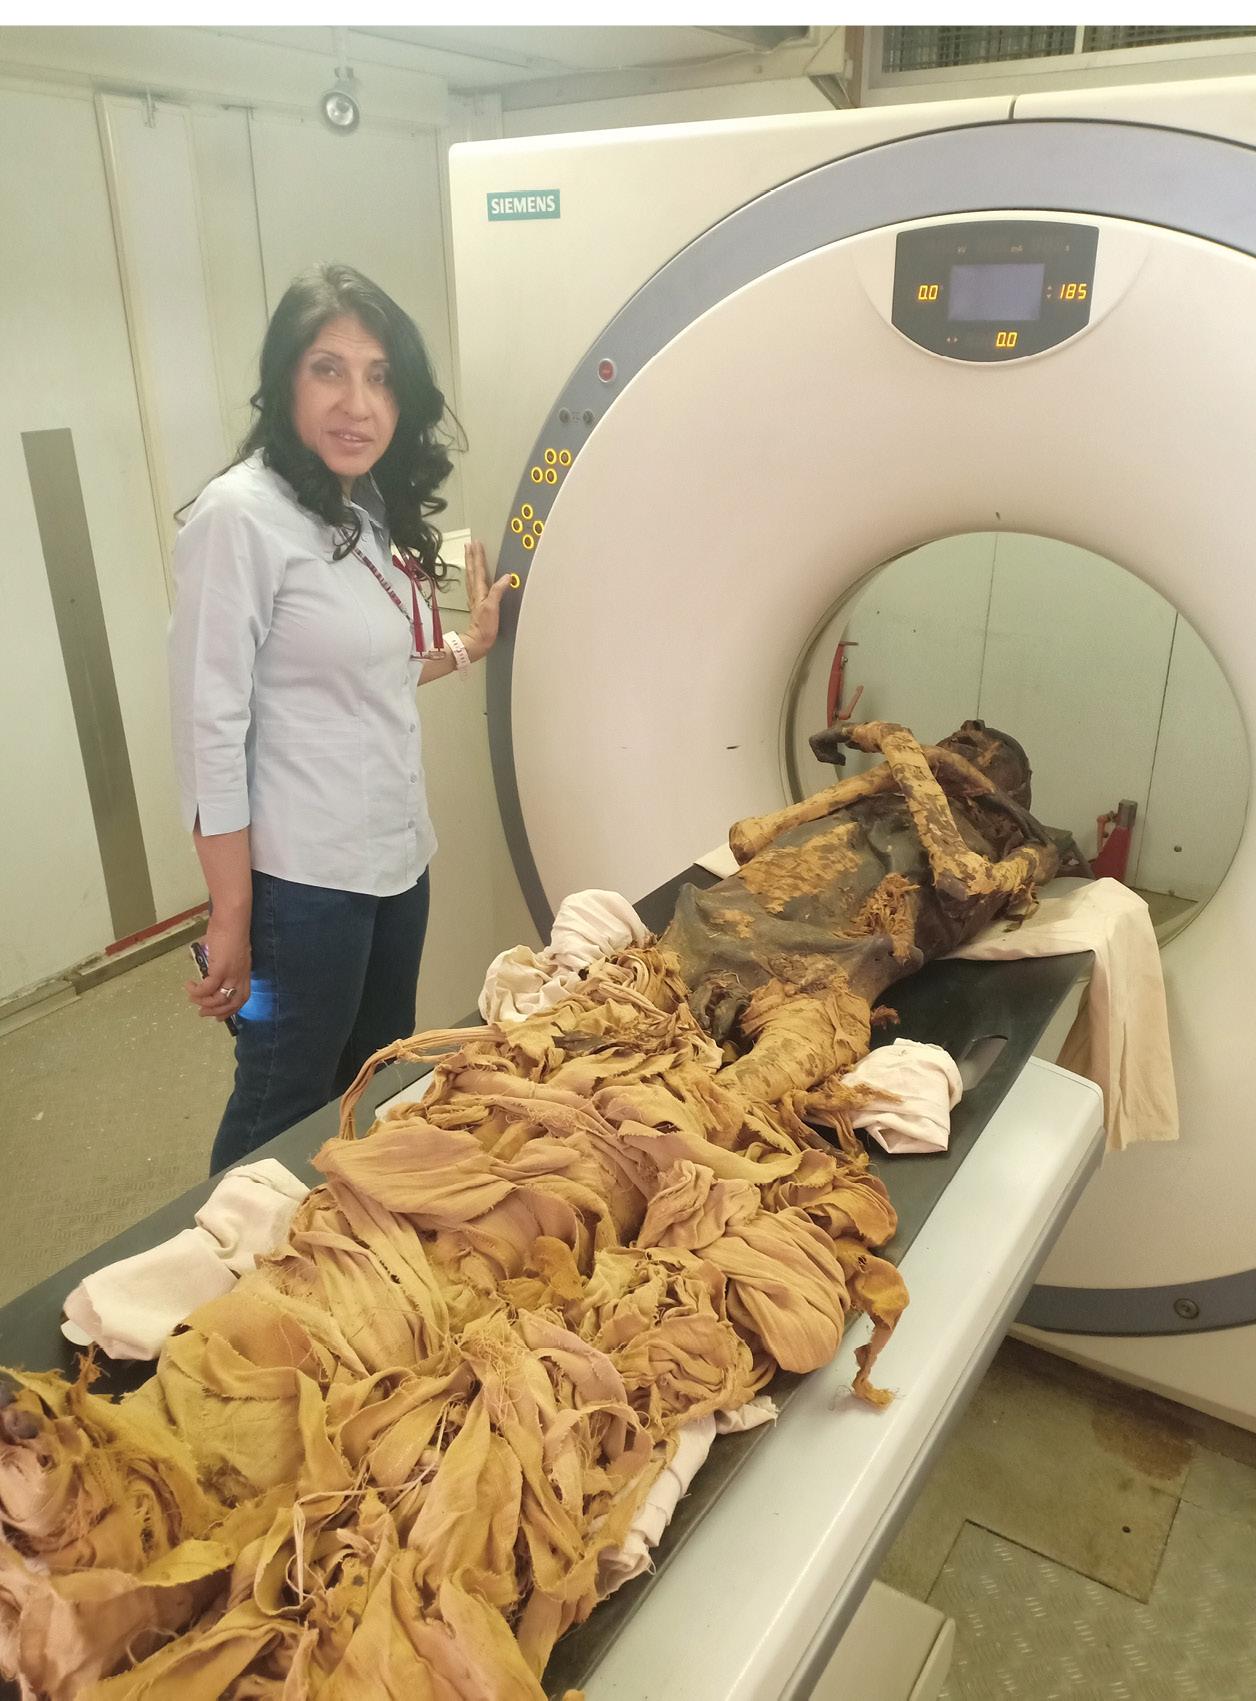 CT scans reveal a pharaoh's violent death